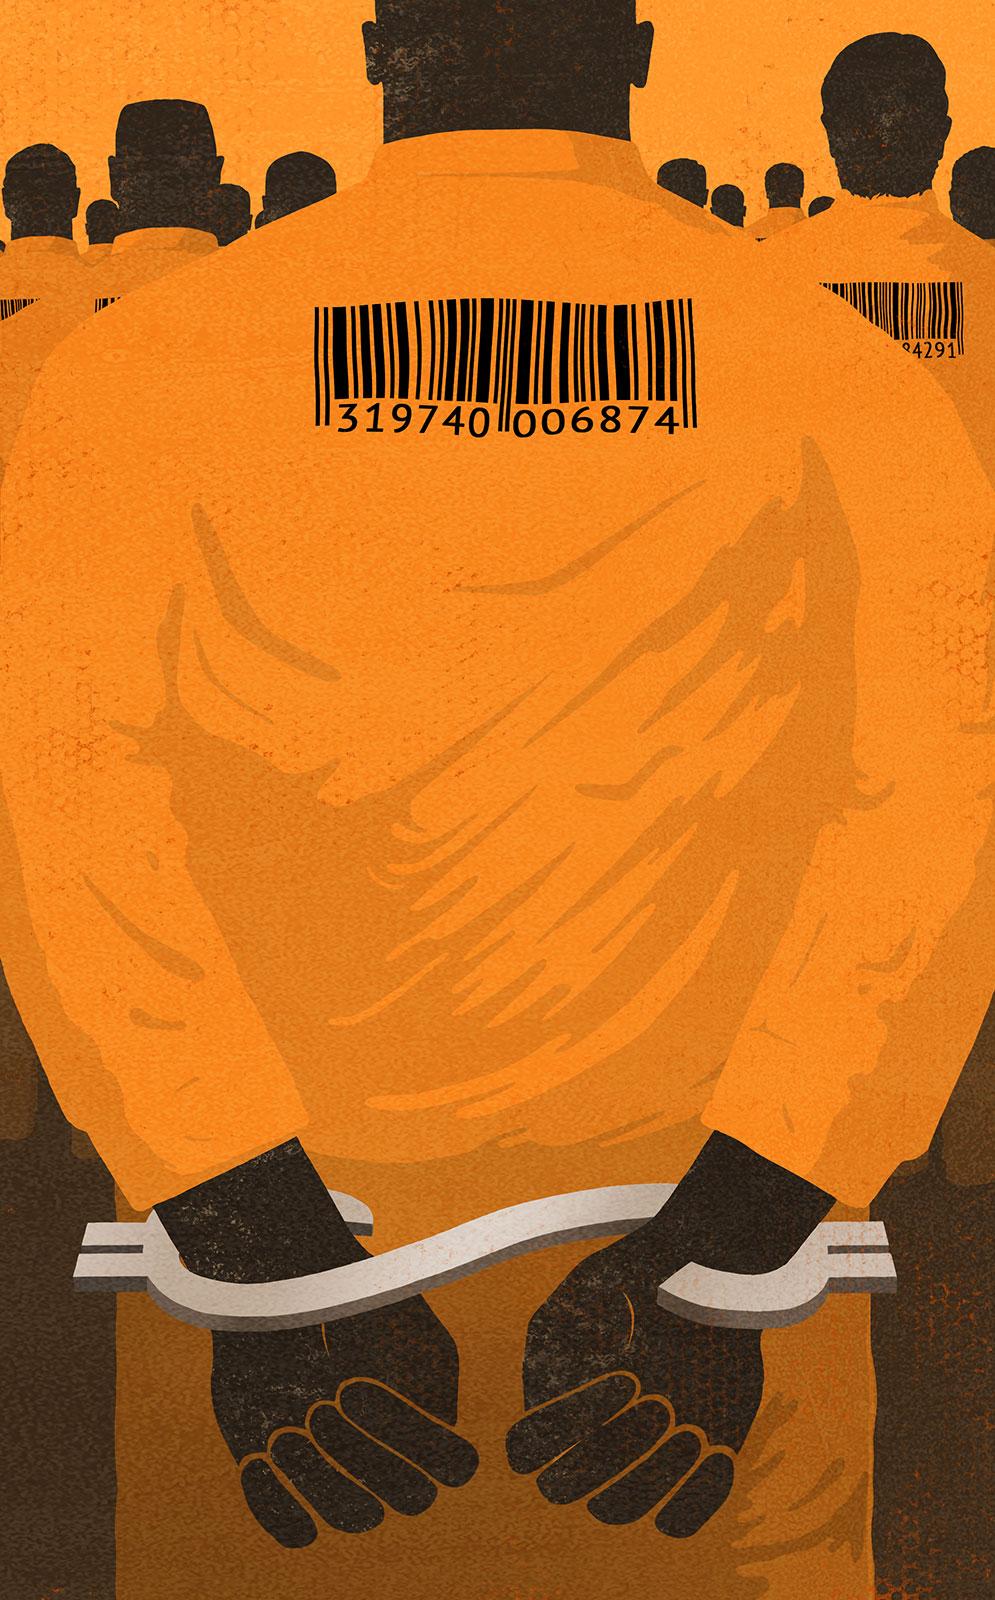 Michael Glenwood / Prison Labor / National Labor Federation